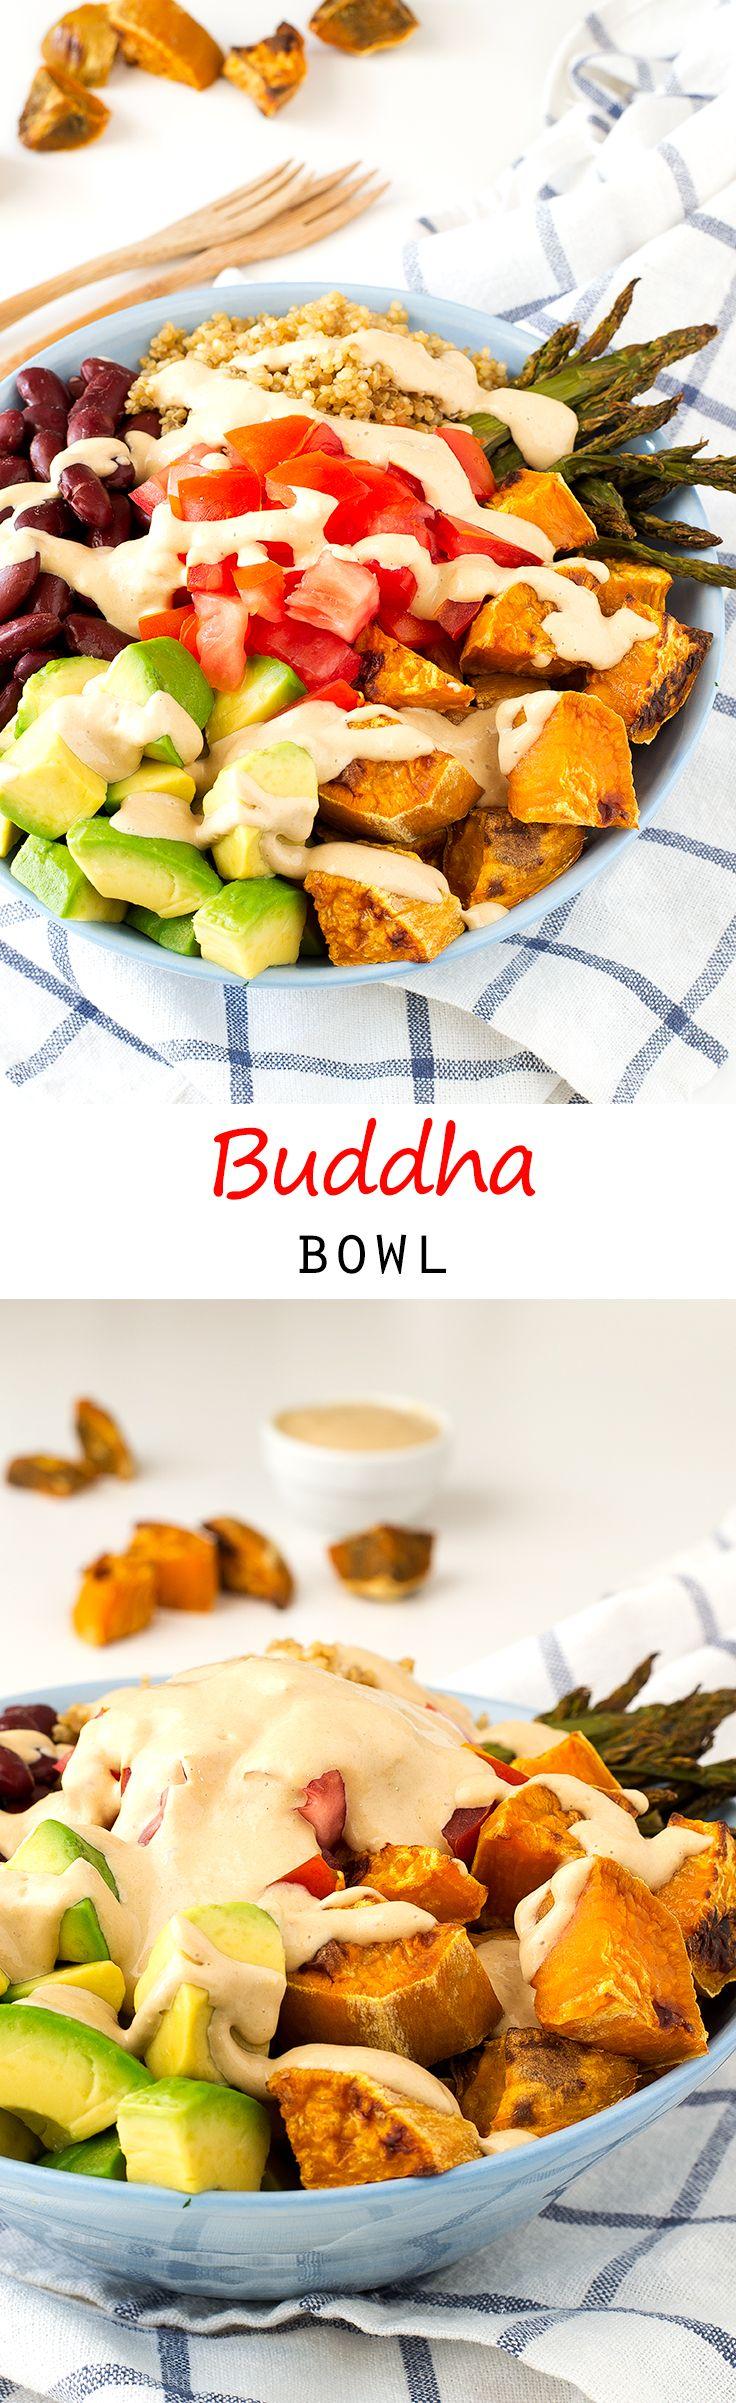 Buddha Bowl   simpleveganblog.com #vegan #glutenfree